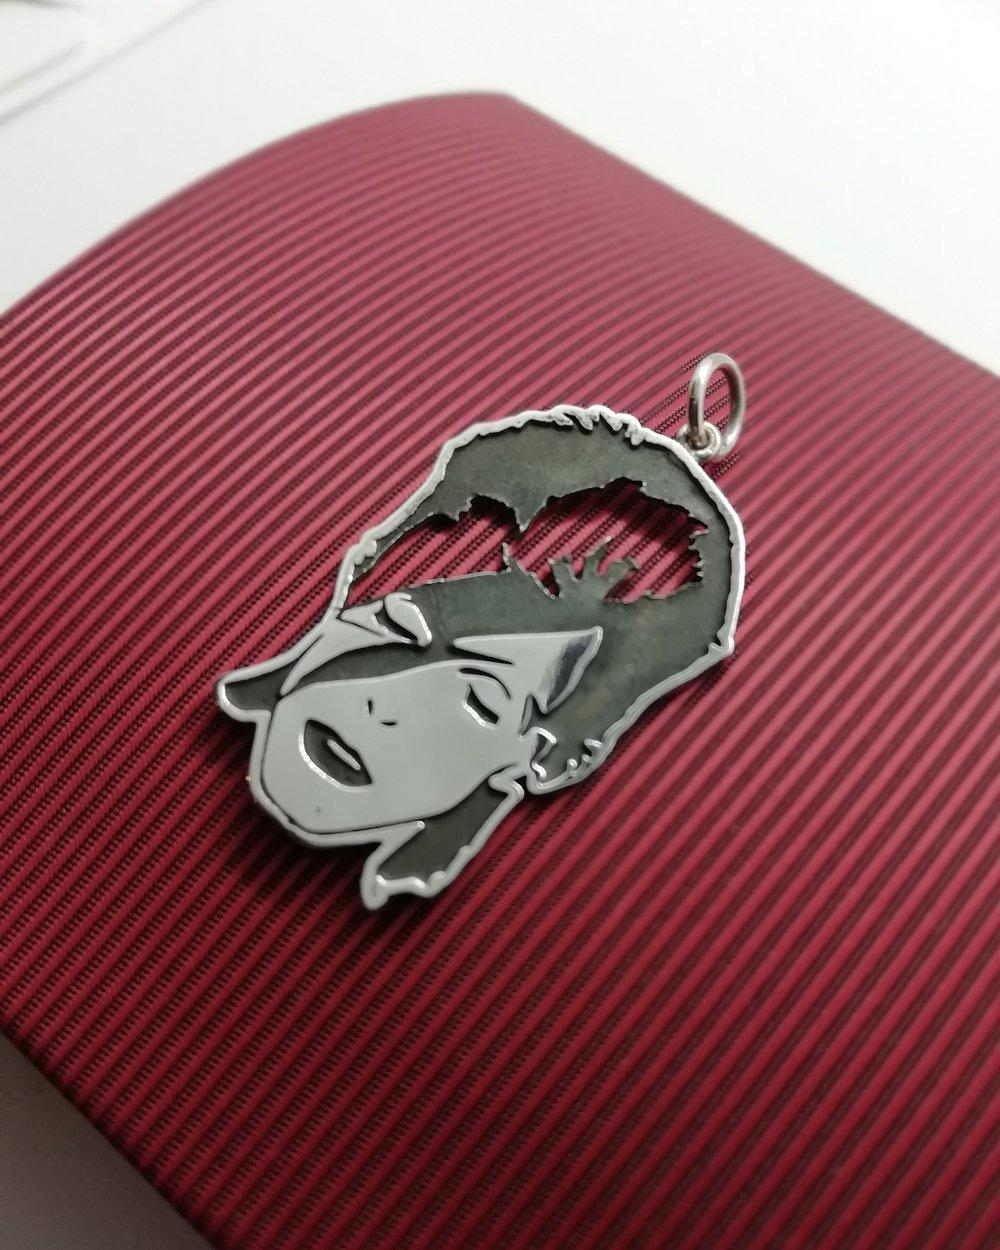 Aladdin Sane Inspired Detailed Pendant (925 Silver)